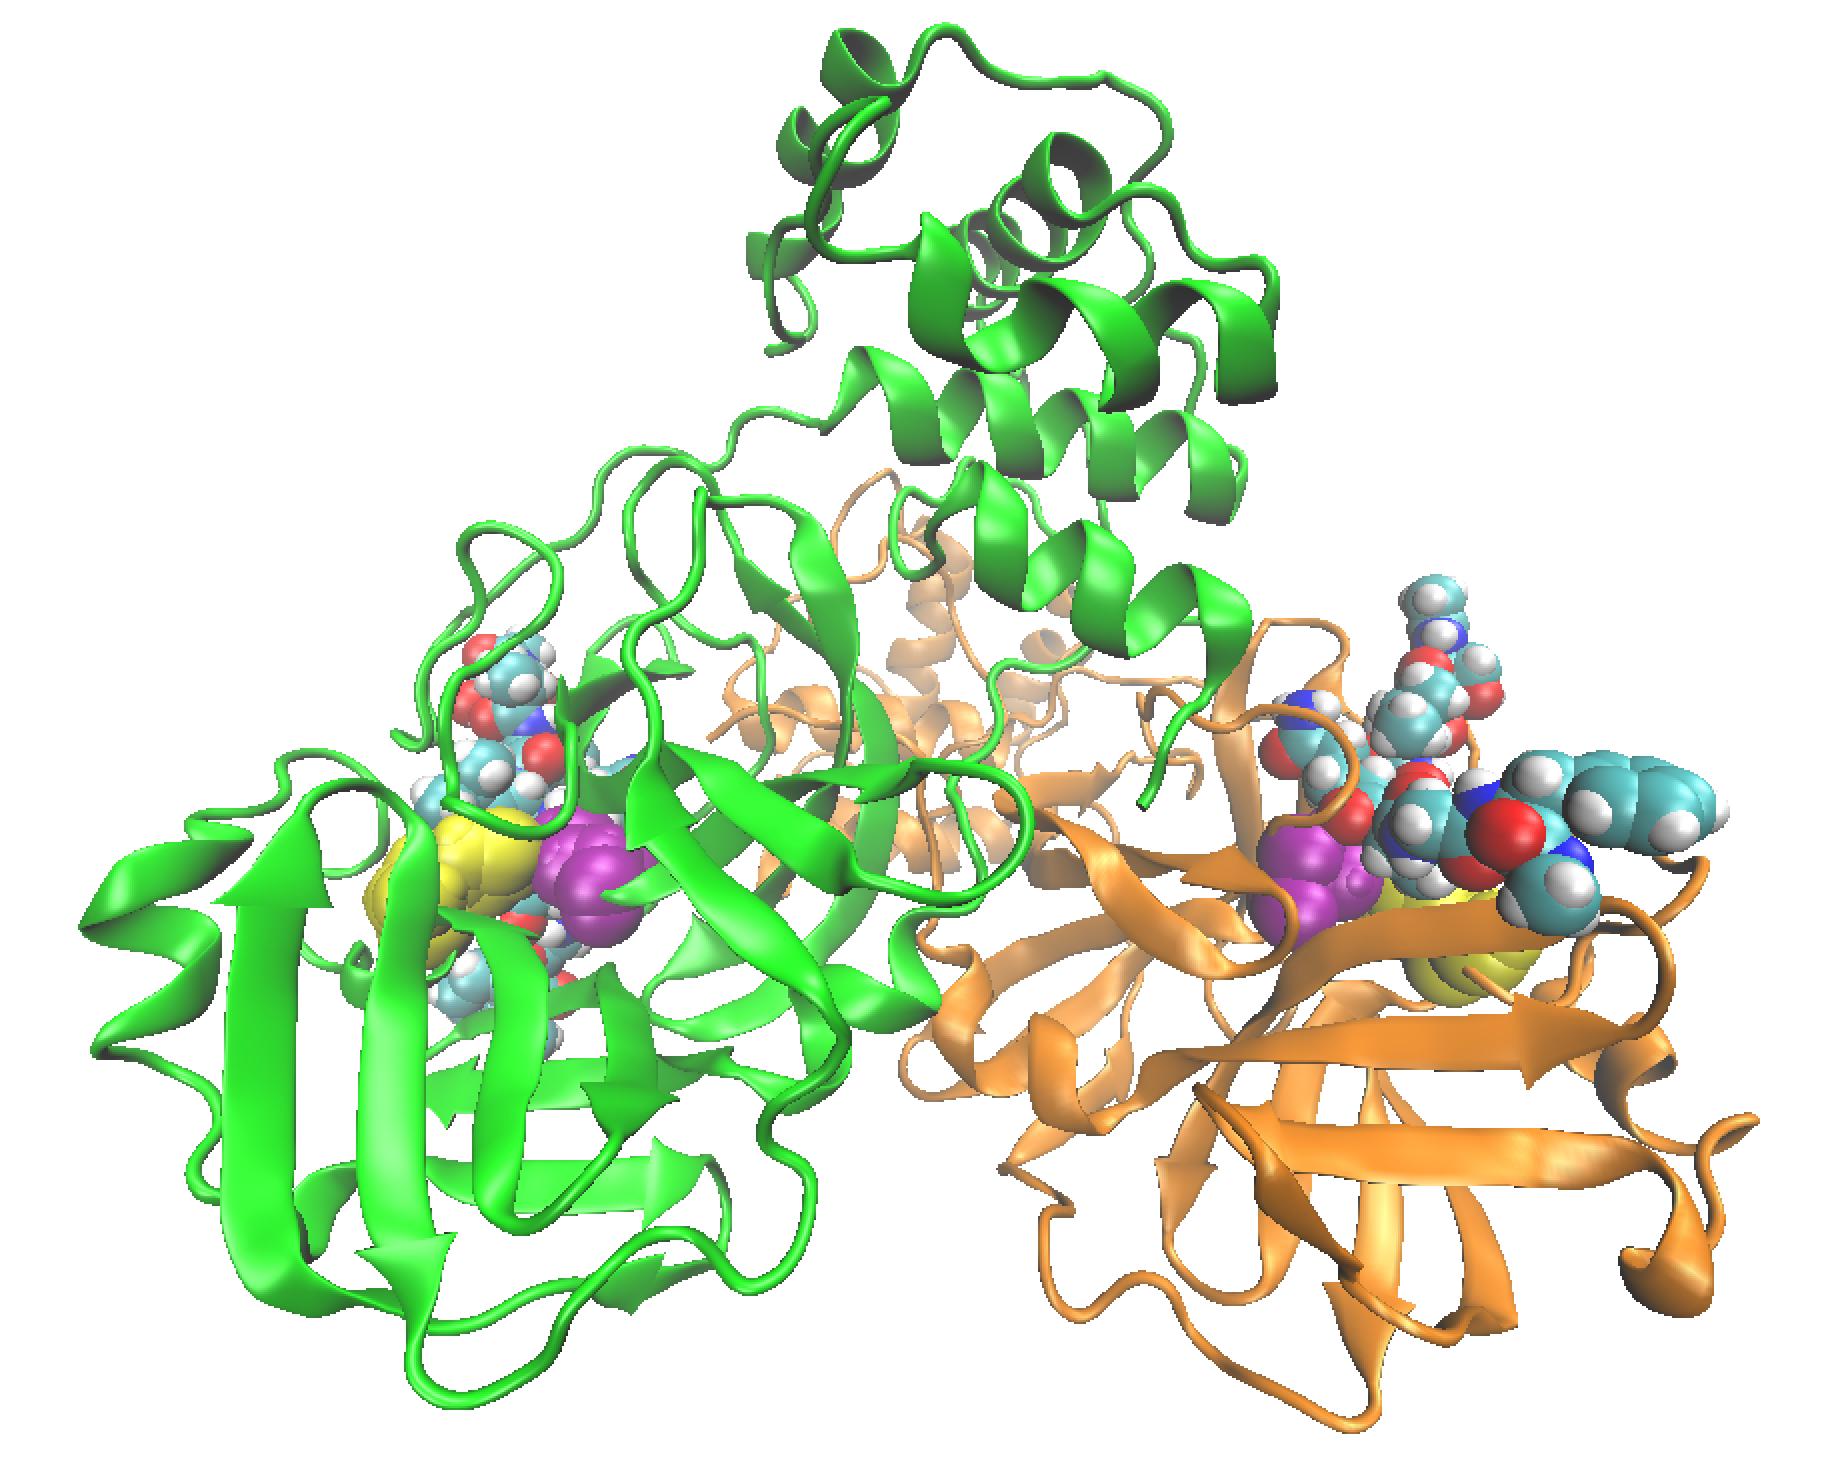 figura 2 proteases coronavirus